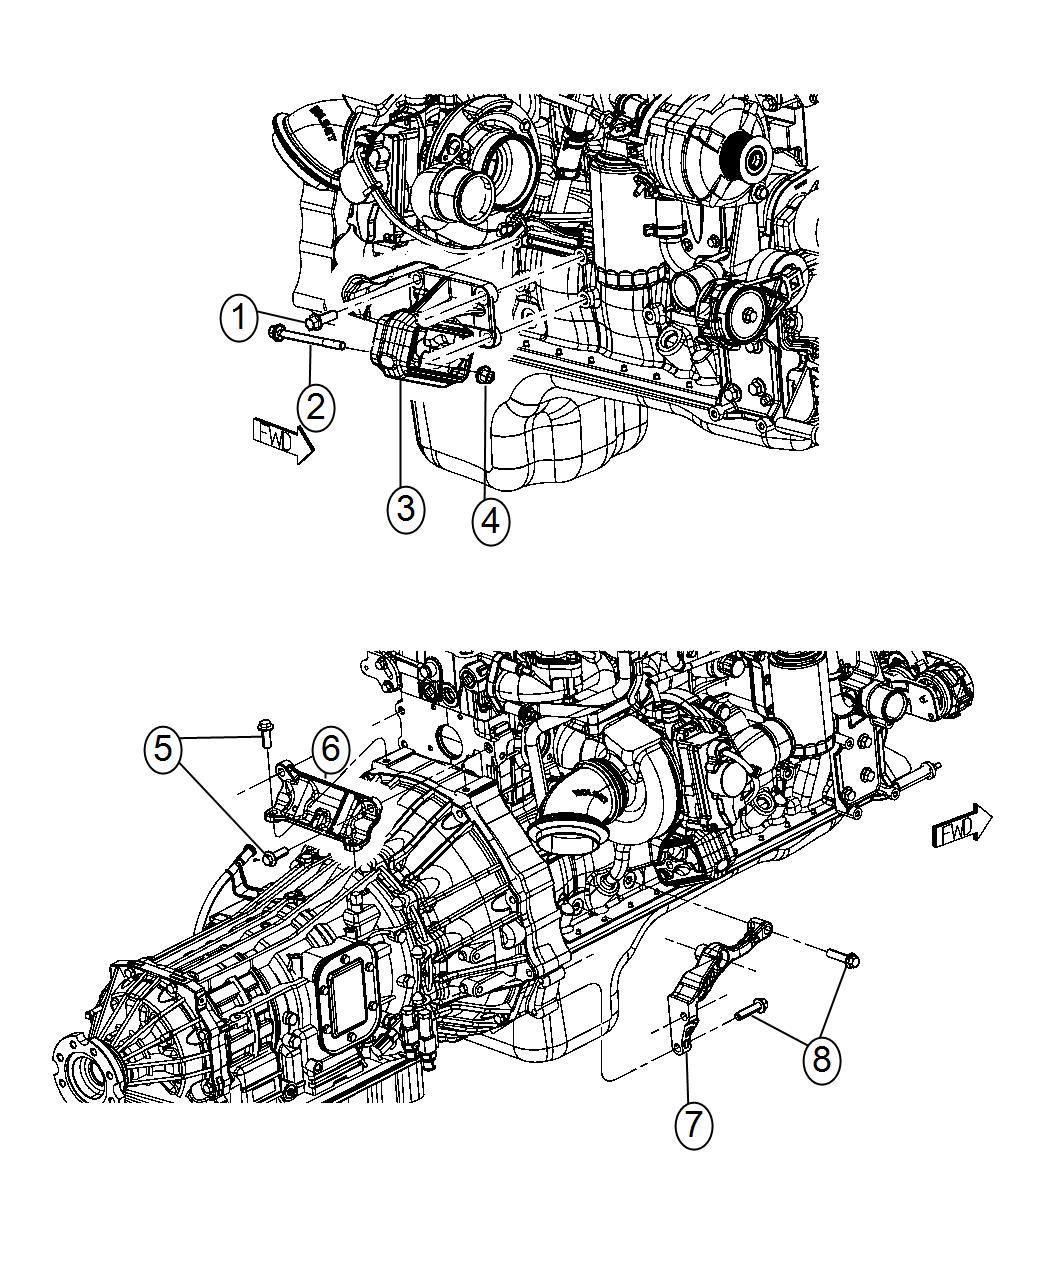 Ram Bracket Engine Mount Right Side 6 Speed